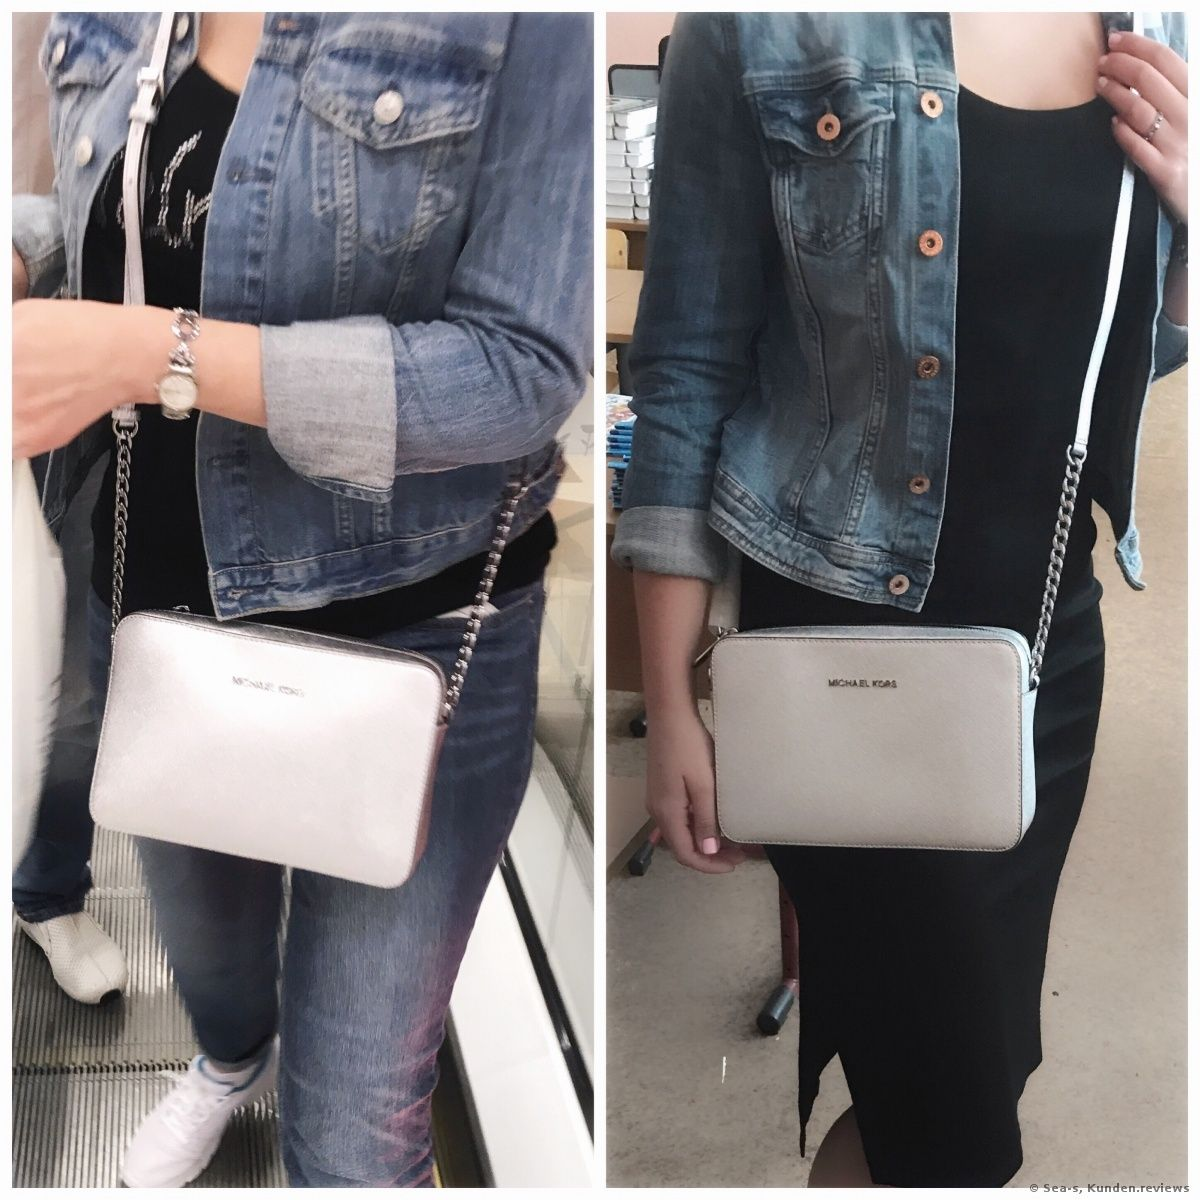 e6c184dee0c9 Michael Kors Jet Set Travel Large Metallic Leather Crossbody  Damenhandtaschen  Möchtet ihr euch eine coole